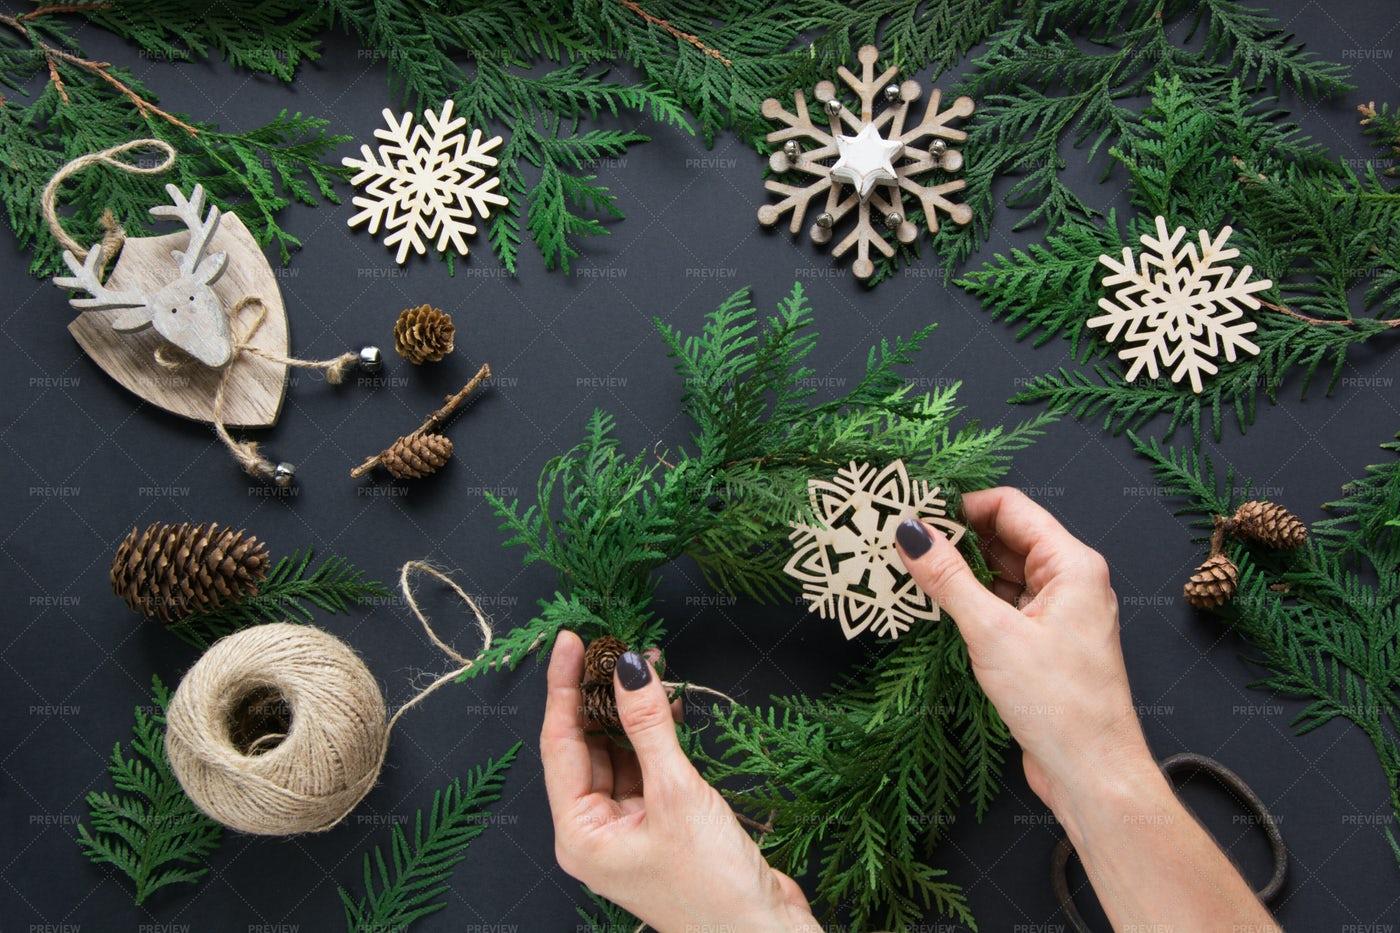 Decorating A Christmas Wreath: Stock Photos